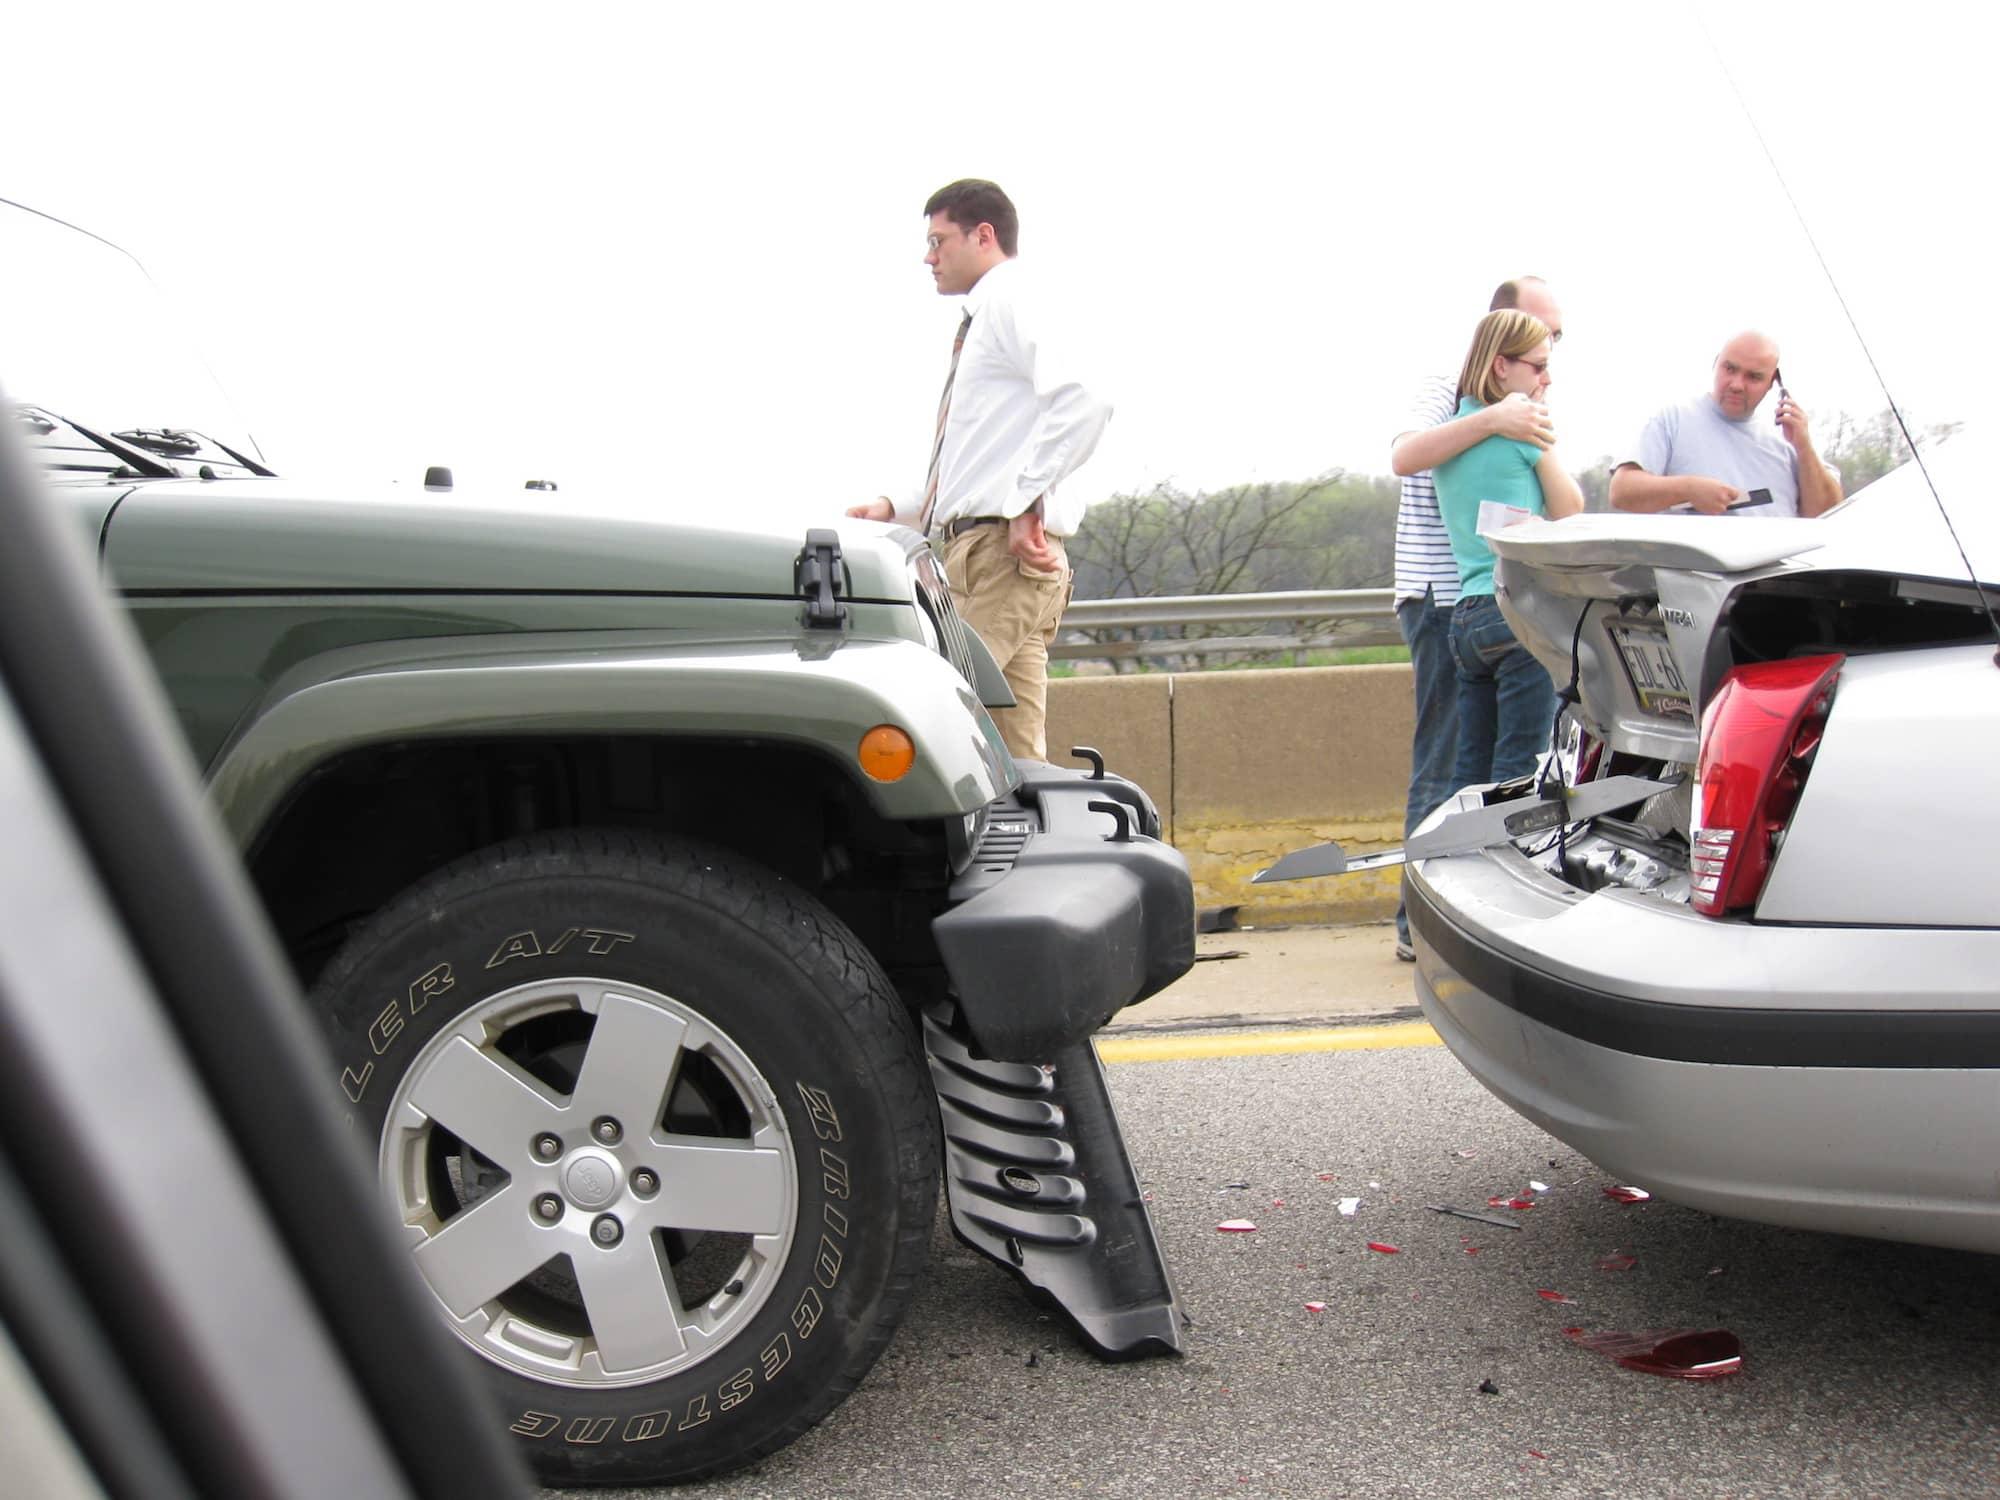 car-accident-chiropractor.jpg